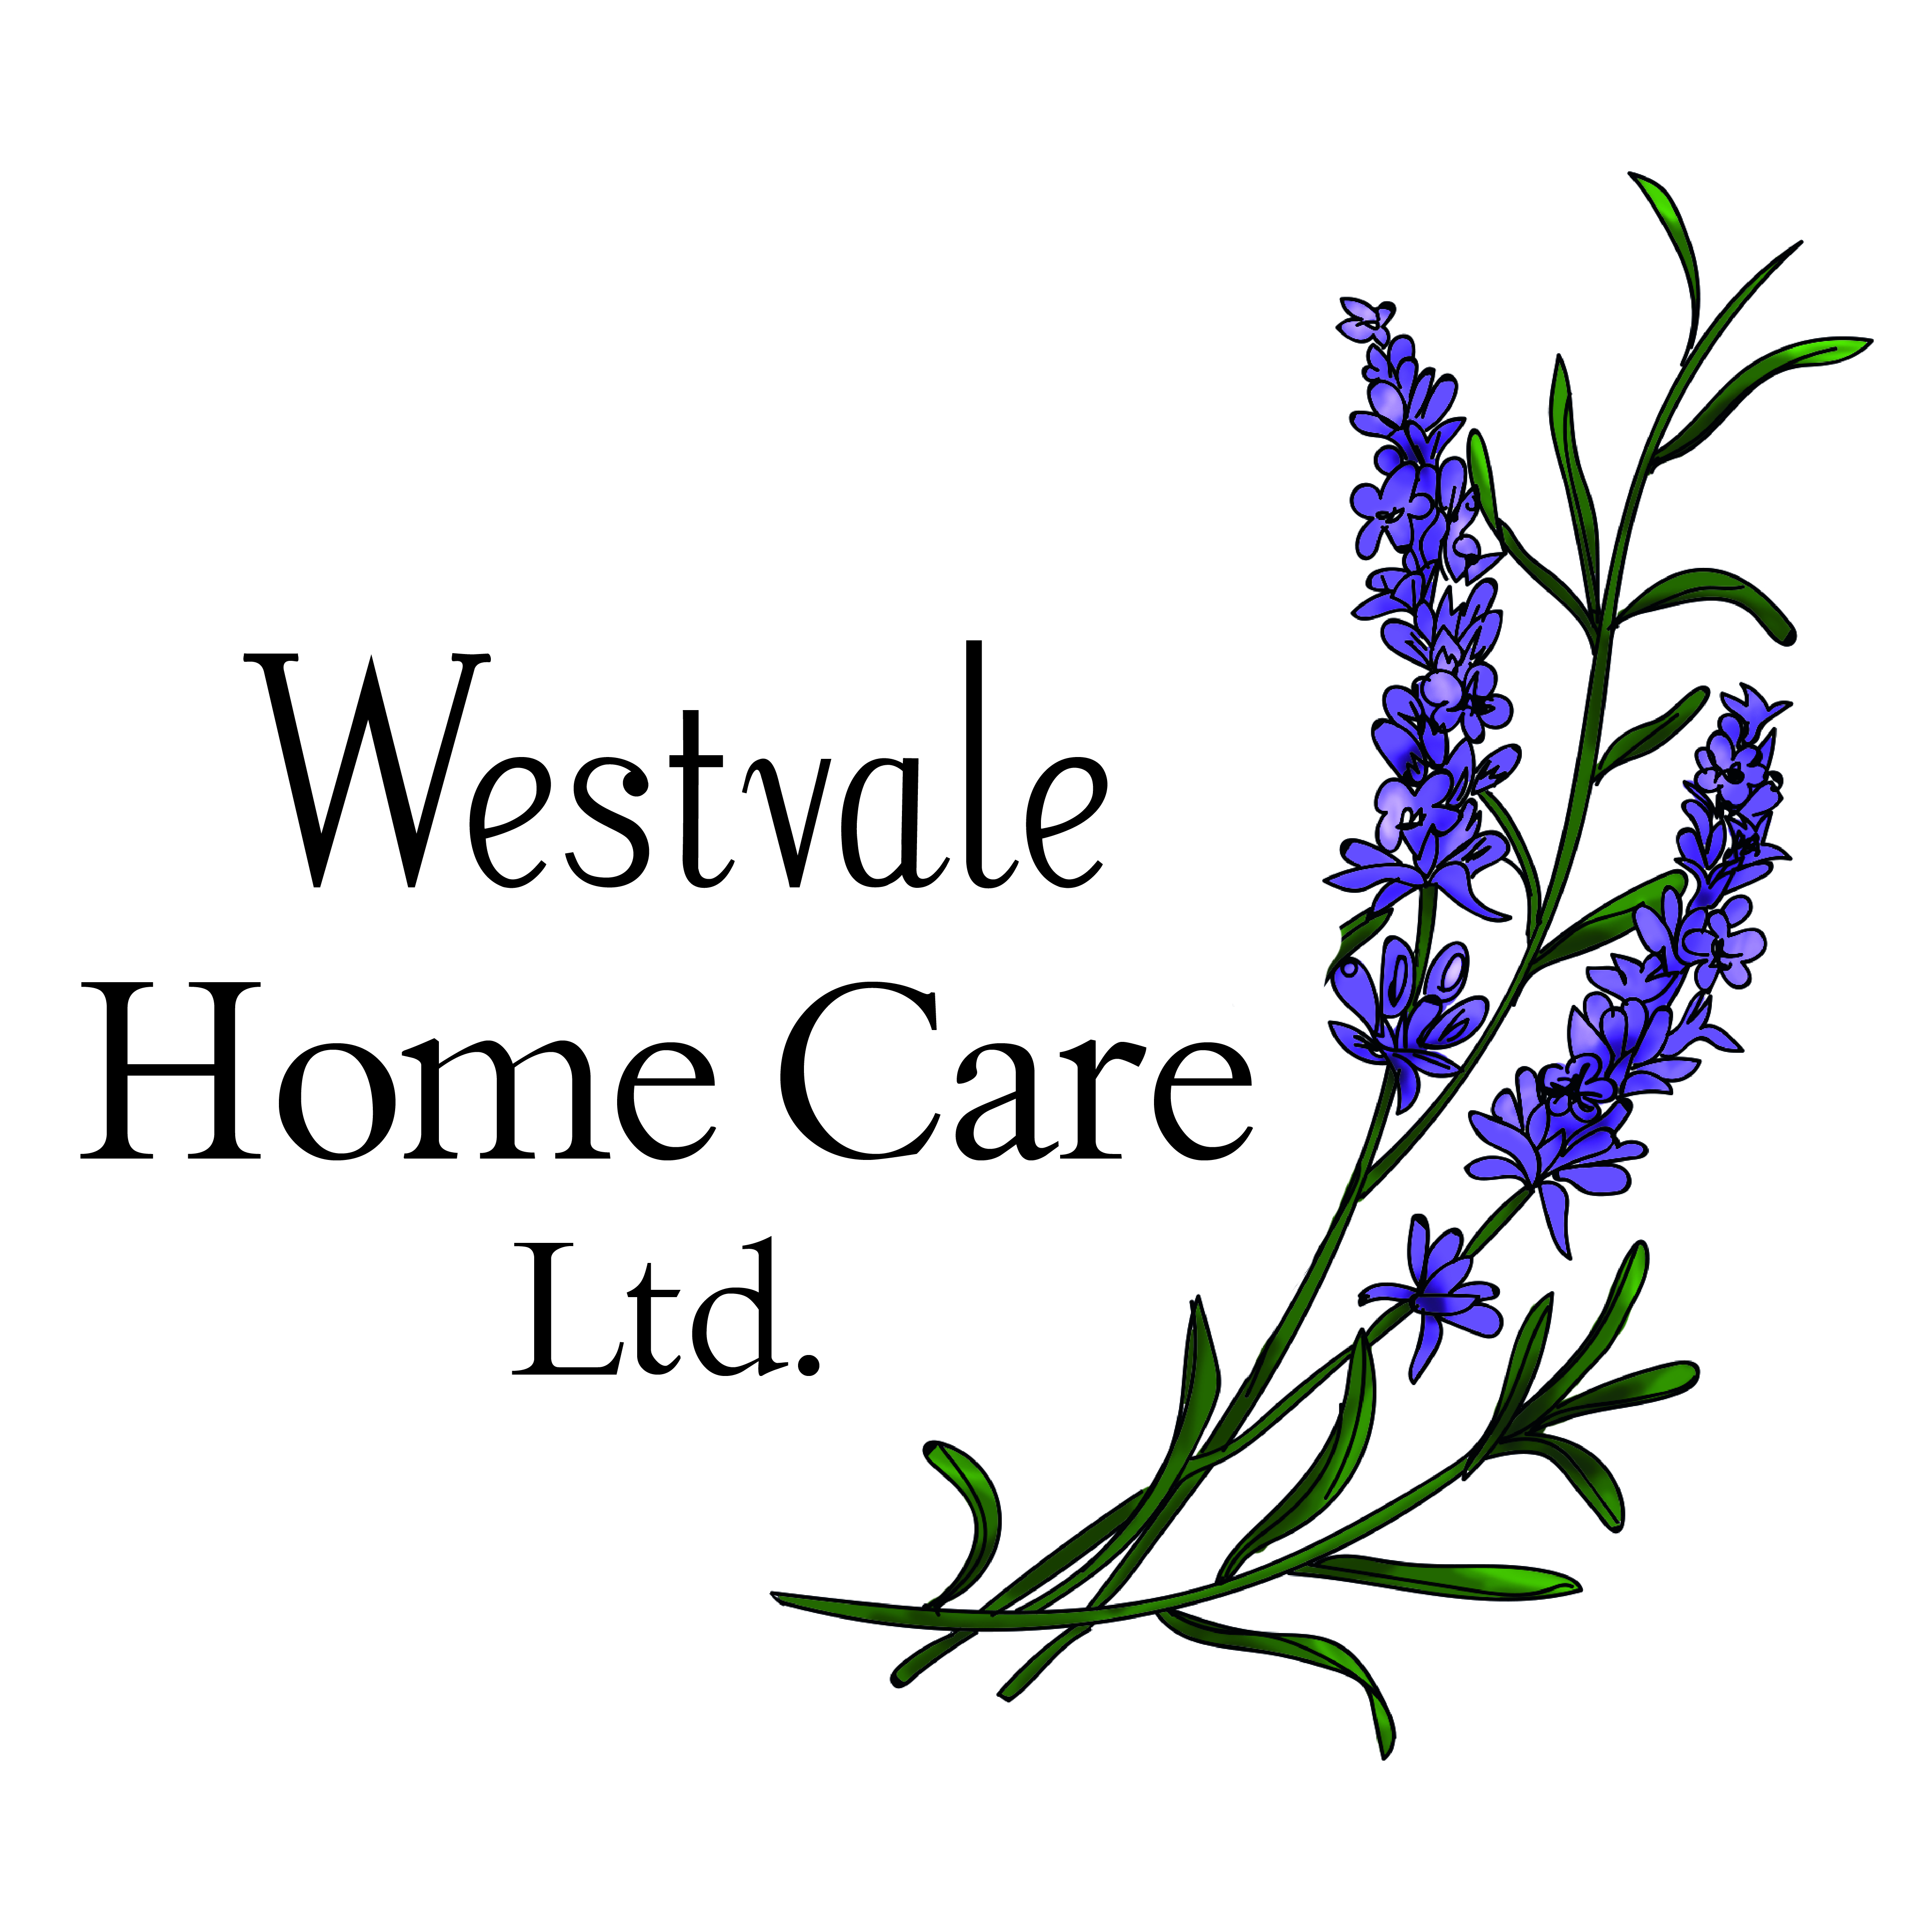 Westvale Home Care